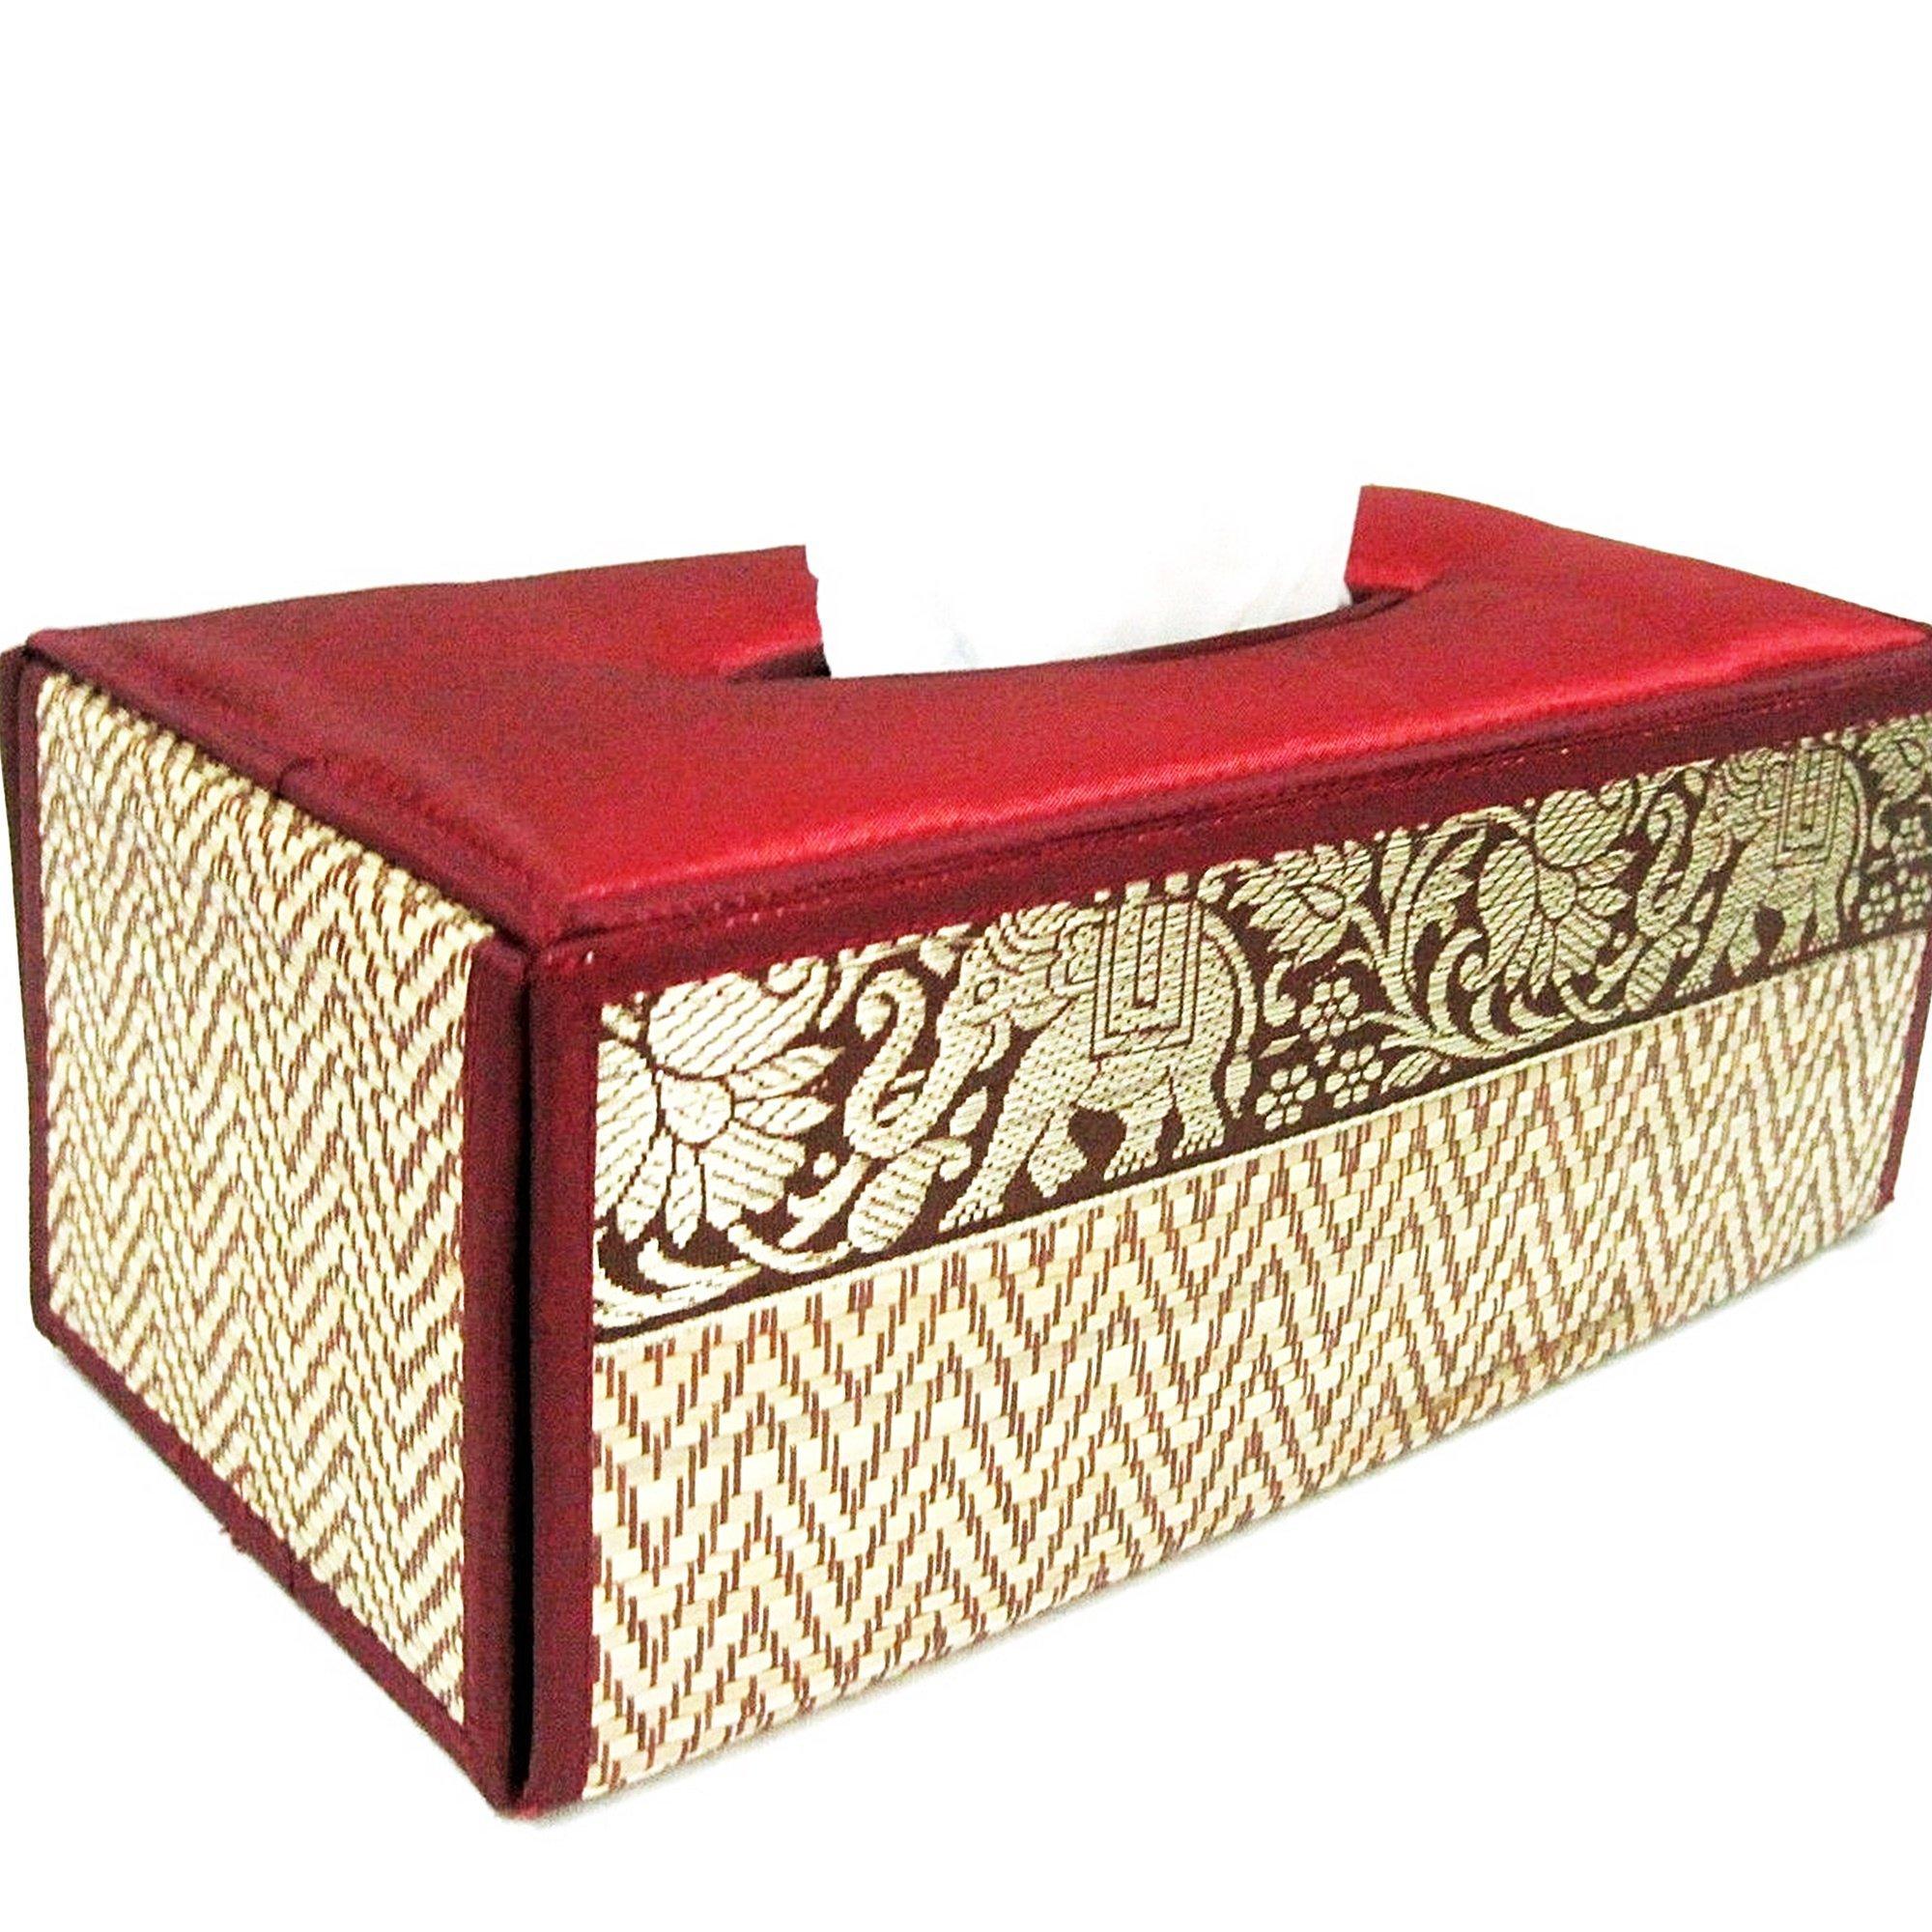 chantubtimplaza Tissue Box Cover Thai Handicraft Elephant Silk Reed Red Color Handmade Home Decor